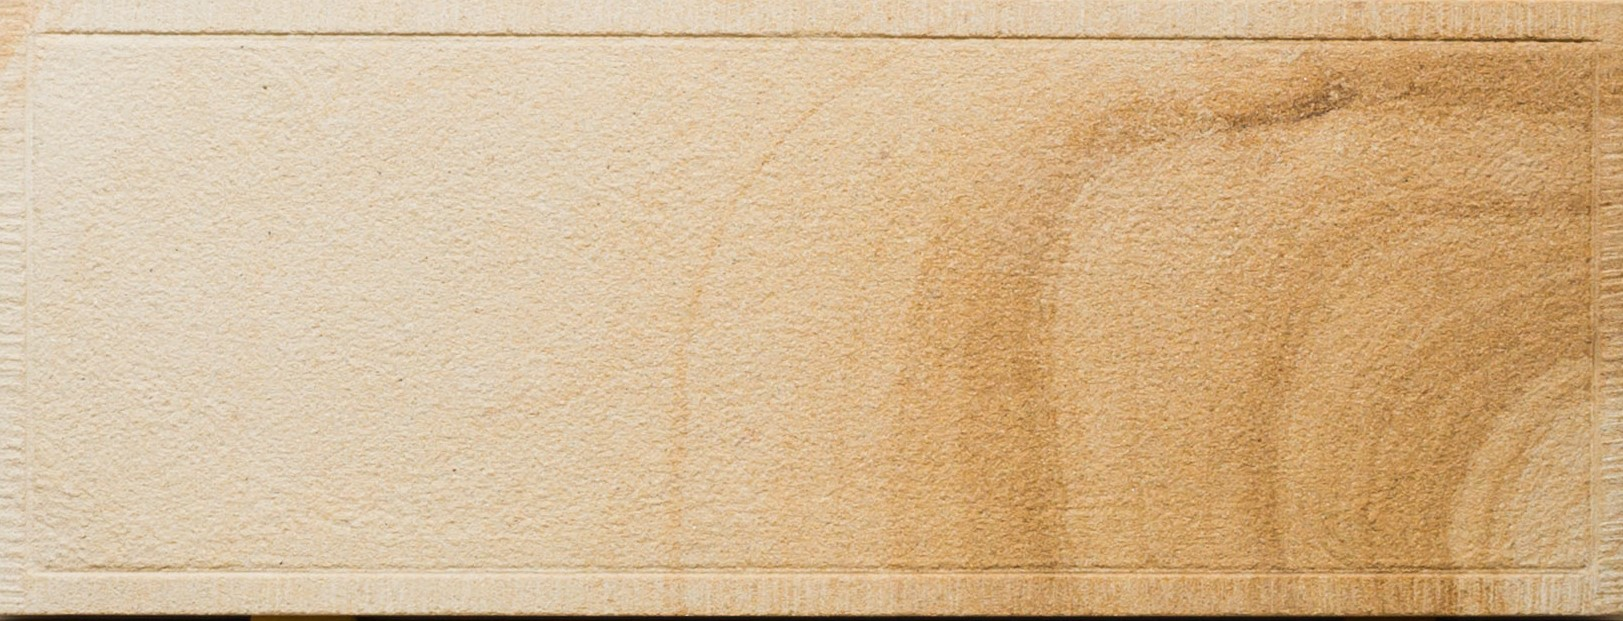 Mt White light Brown Range - Gangsawn with tooled margin (2).jpg